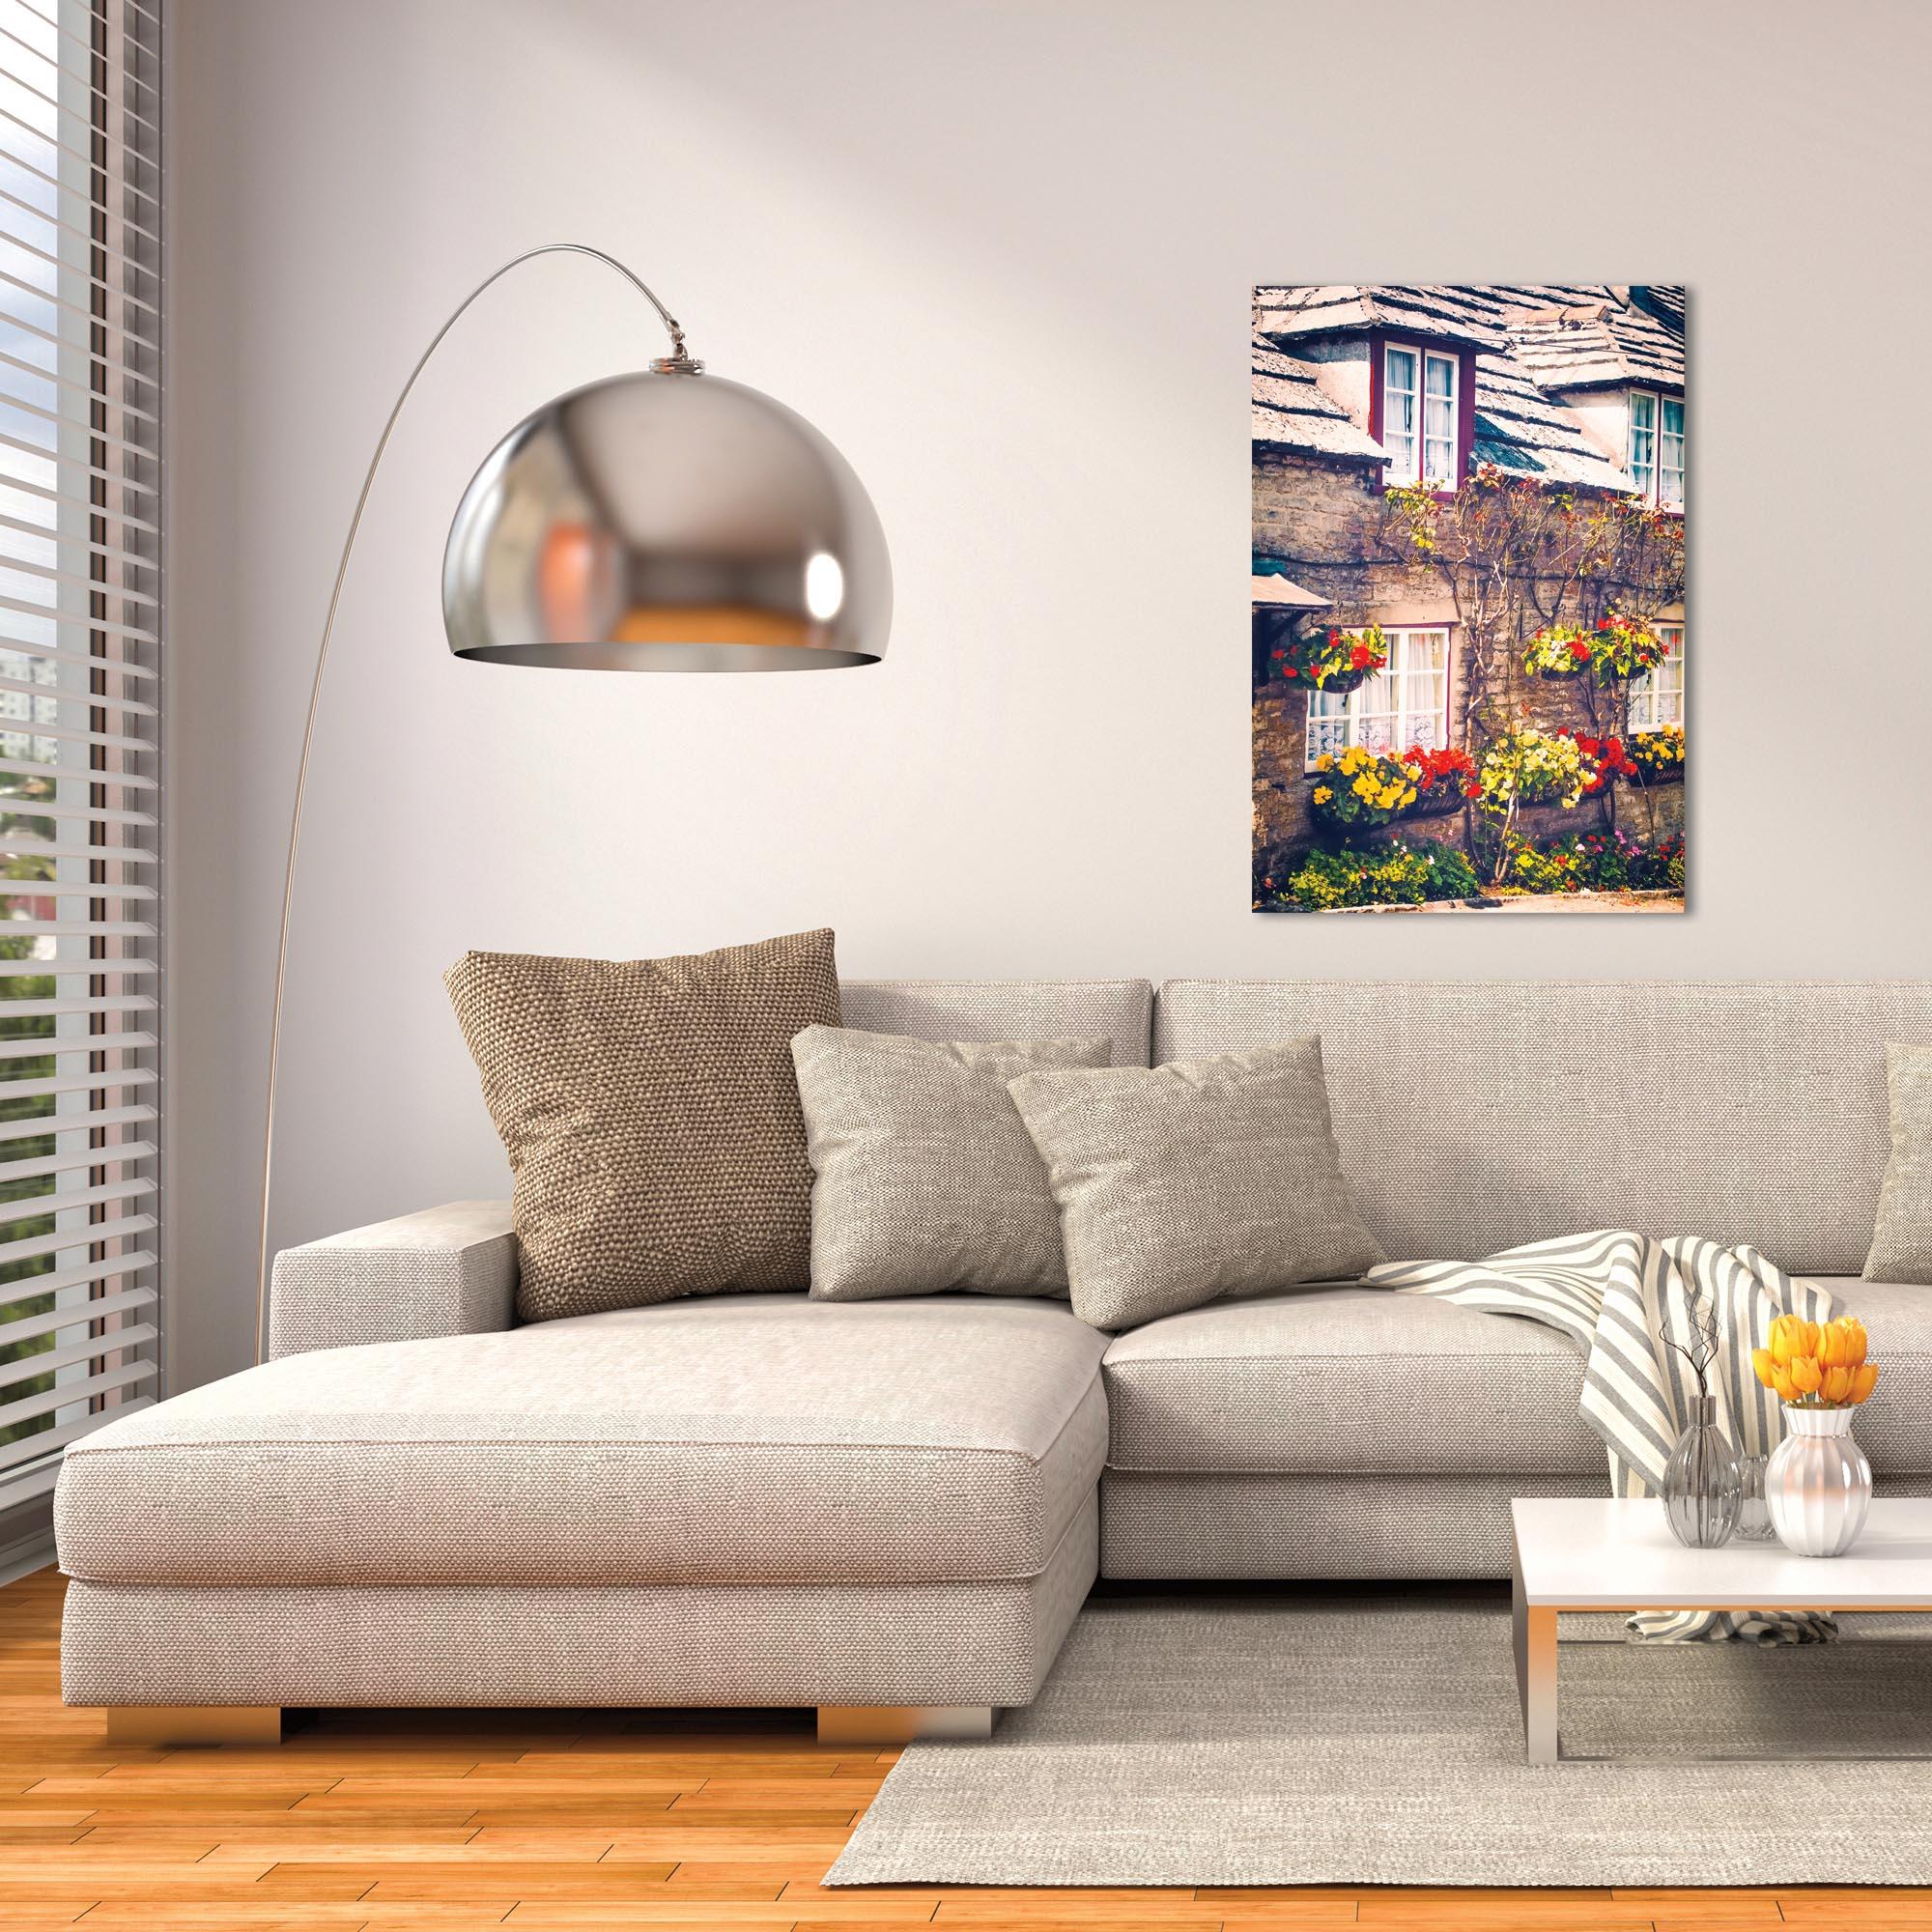 Cottage Wall Art 'Flowered Bricks' - Brick House Decor on Metal or Plexiglass - Lifestyle View